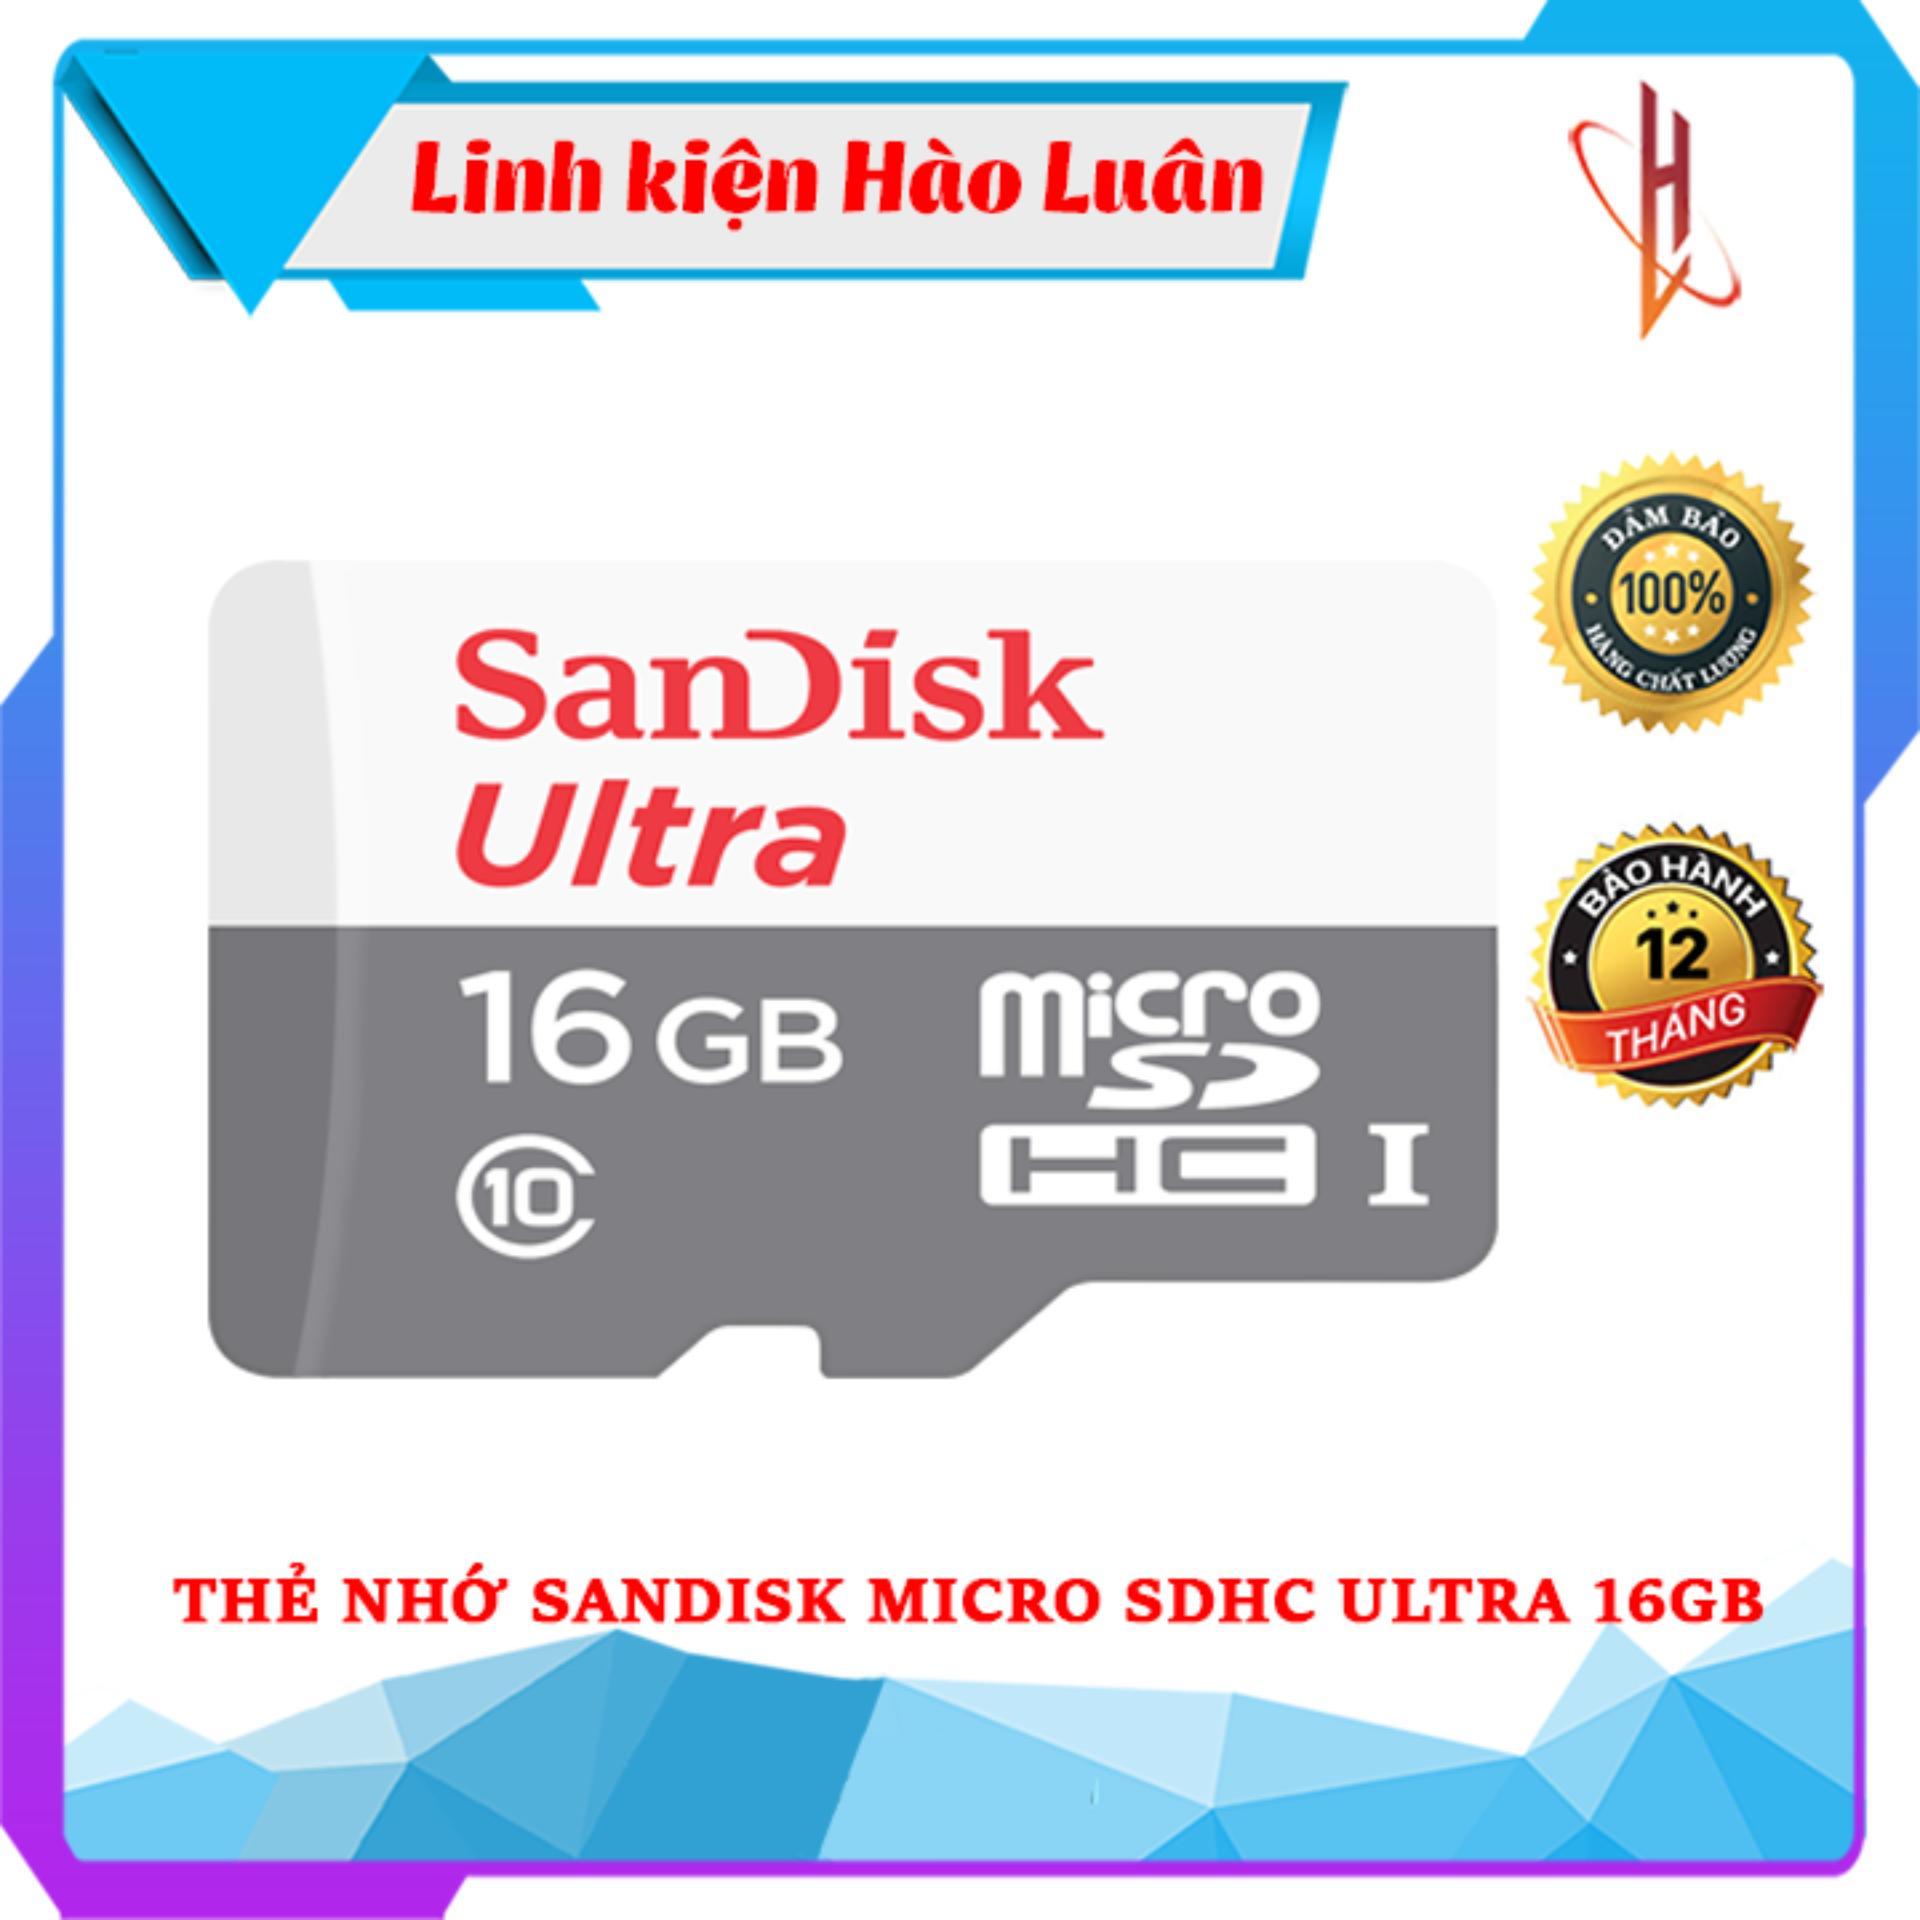 Thẻ nhớ SanDisk MicroSDHC Ultra 16GB/32GB/64G/128GB